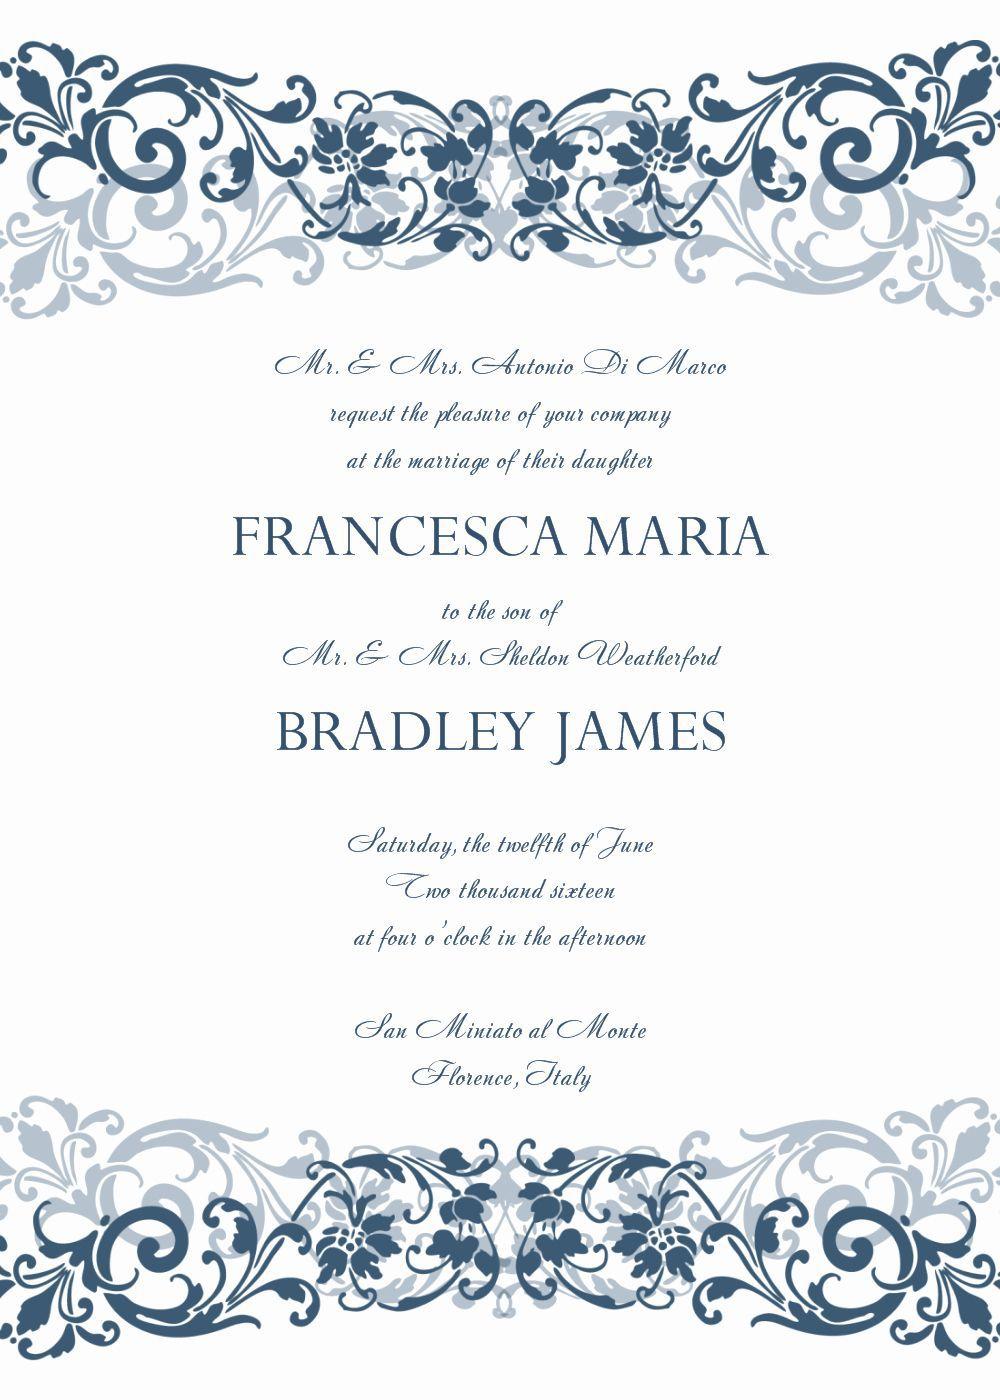 008 Unusual Formal Wedding Invitation Template Free Highest Clarity Full